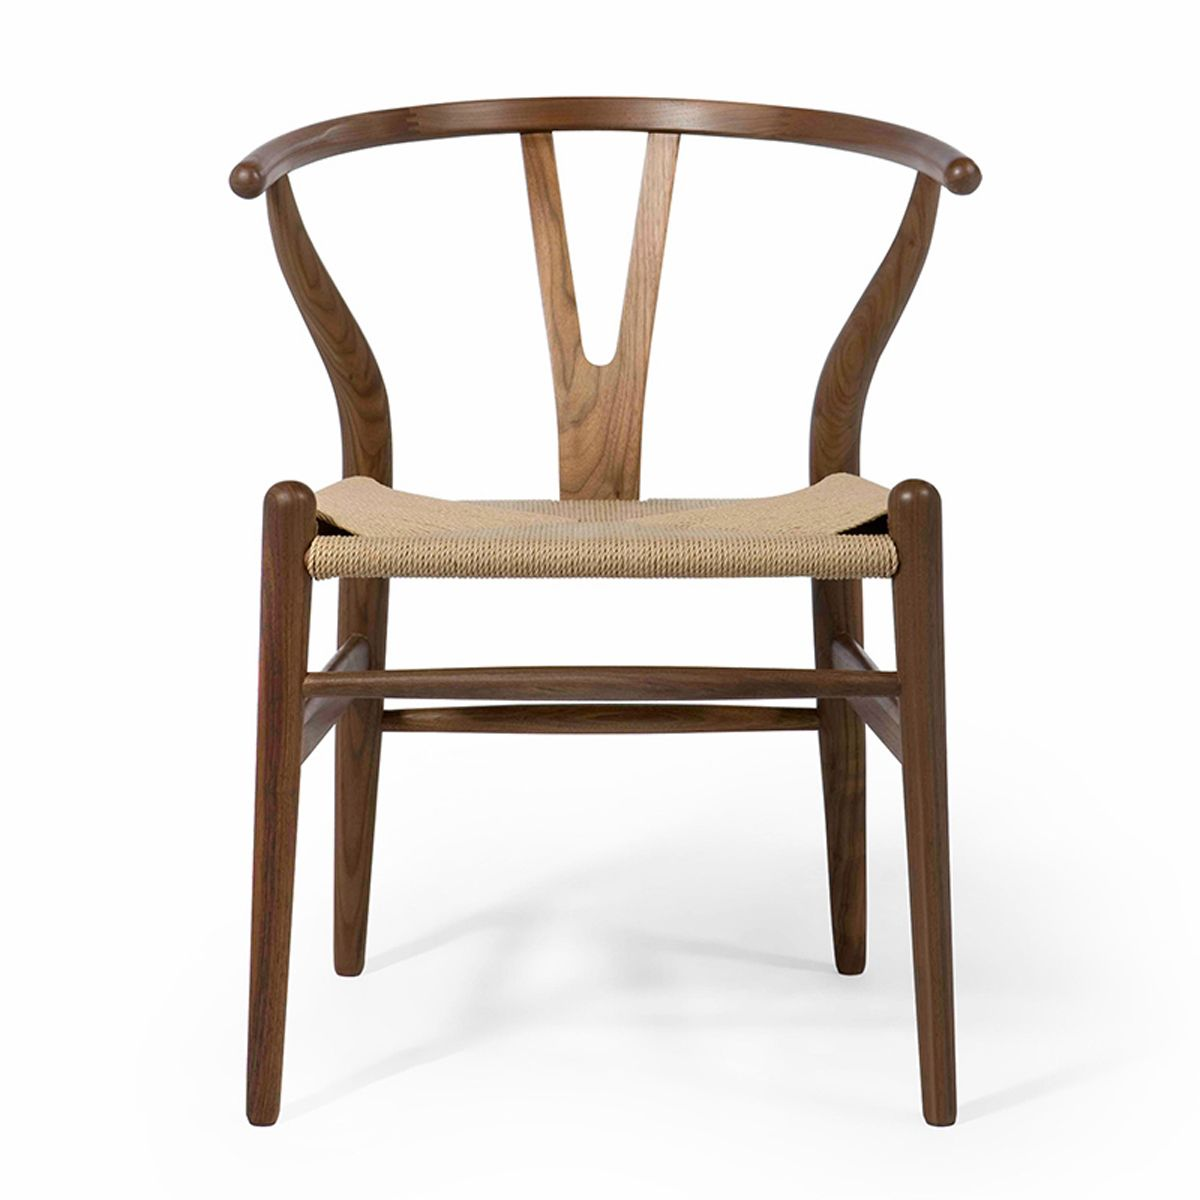 Hans wegner ch24 wishbone chair wishbone chair chair